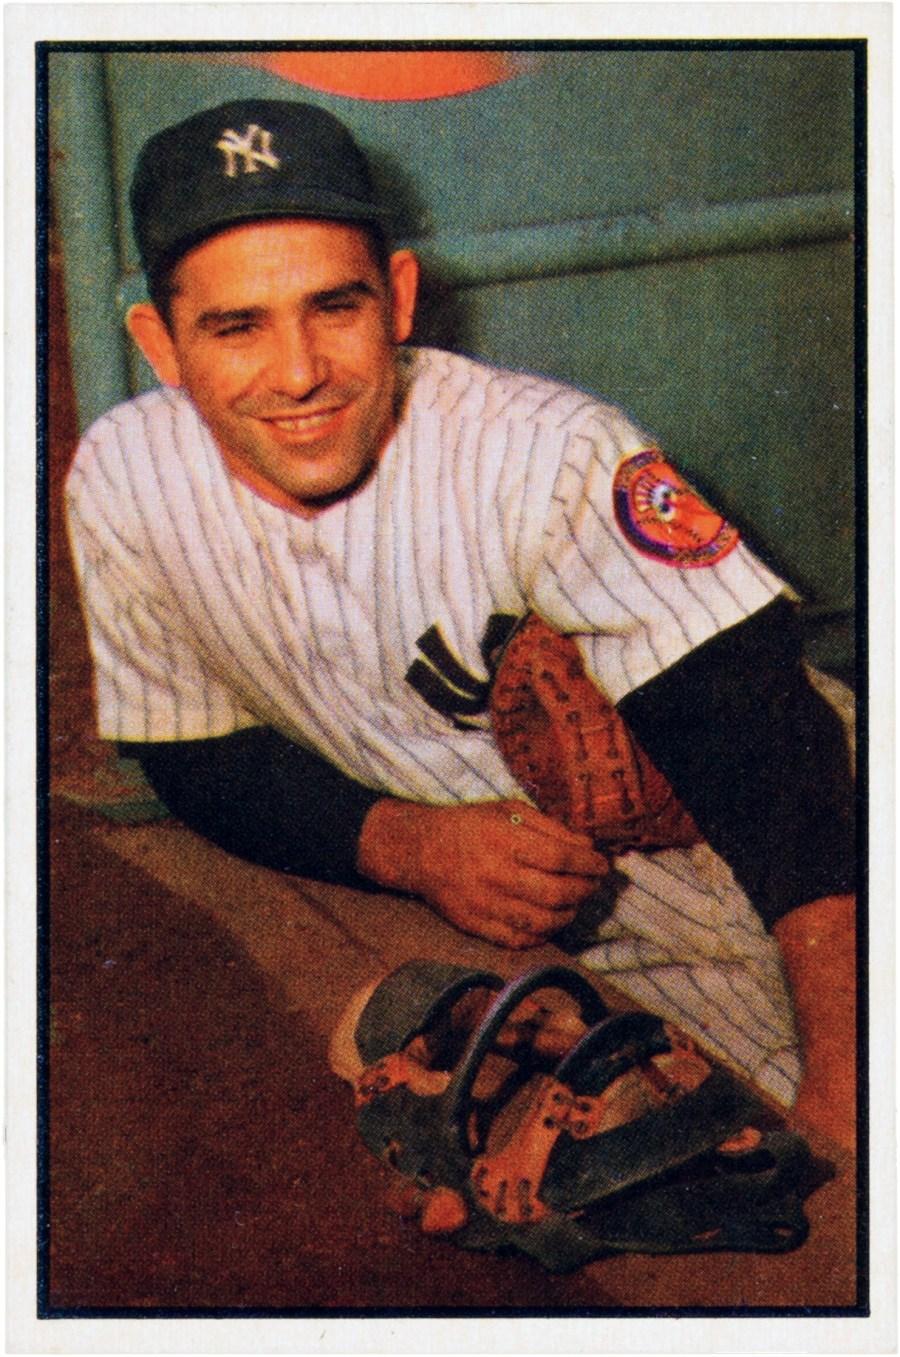 1953_Bowman_Yogi_Berra